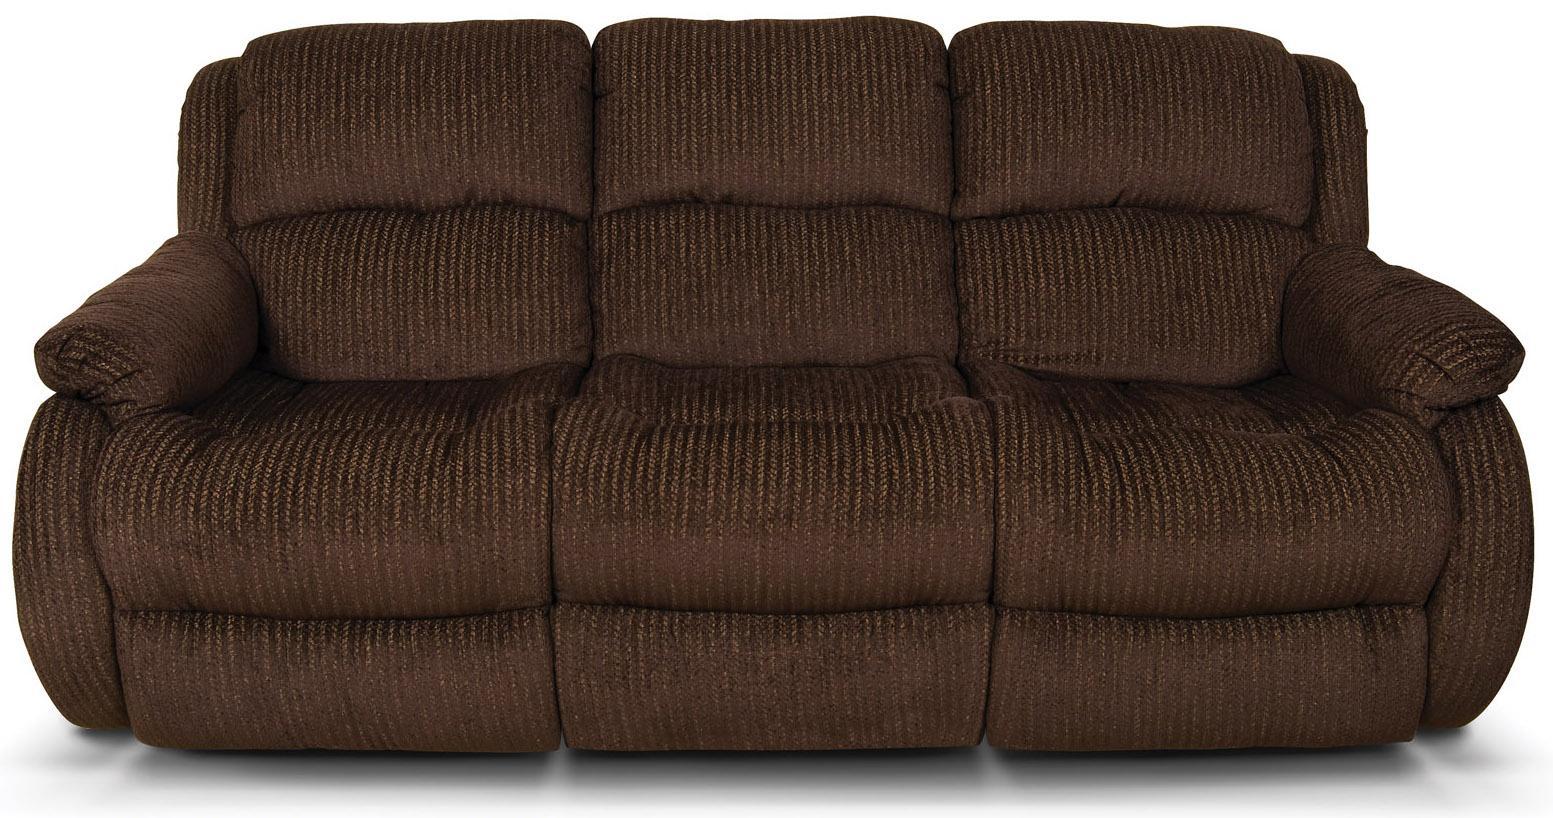 England Hali Reclining Sofa - Item Number: 2011